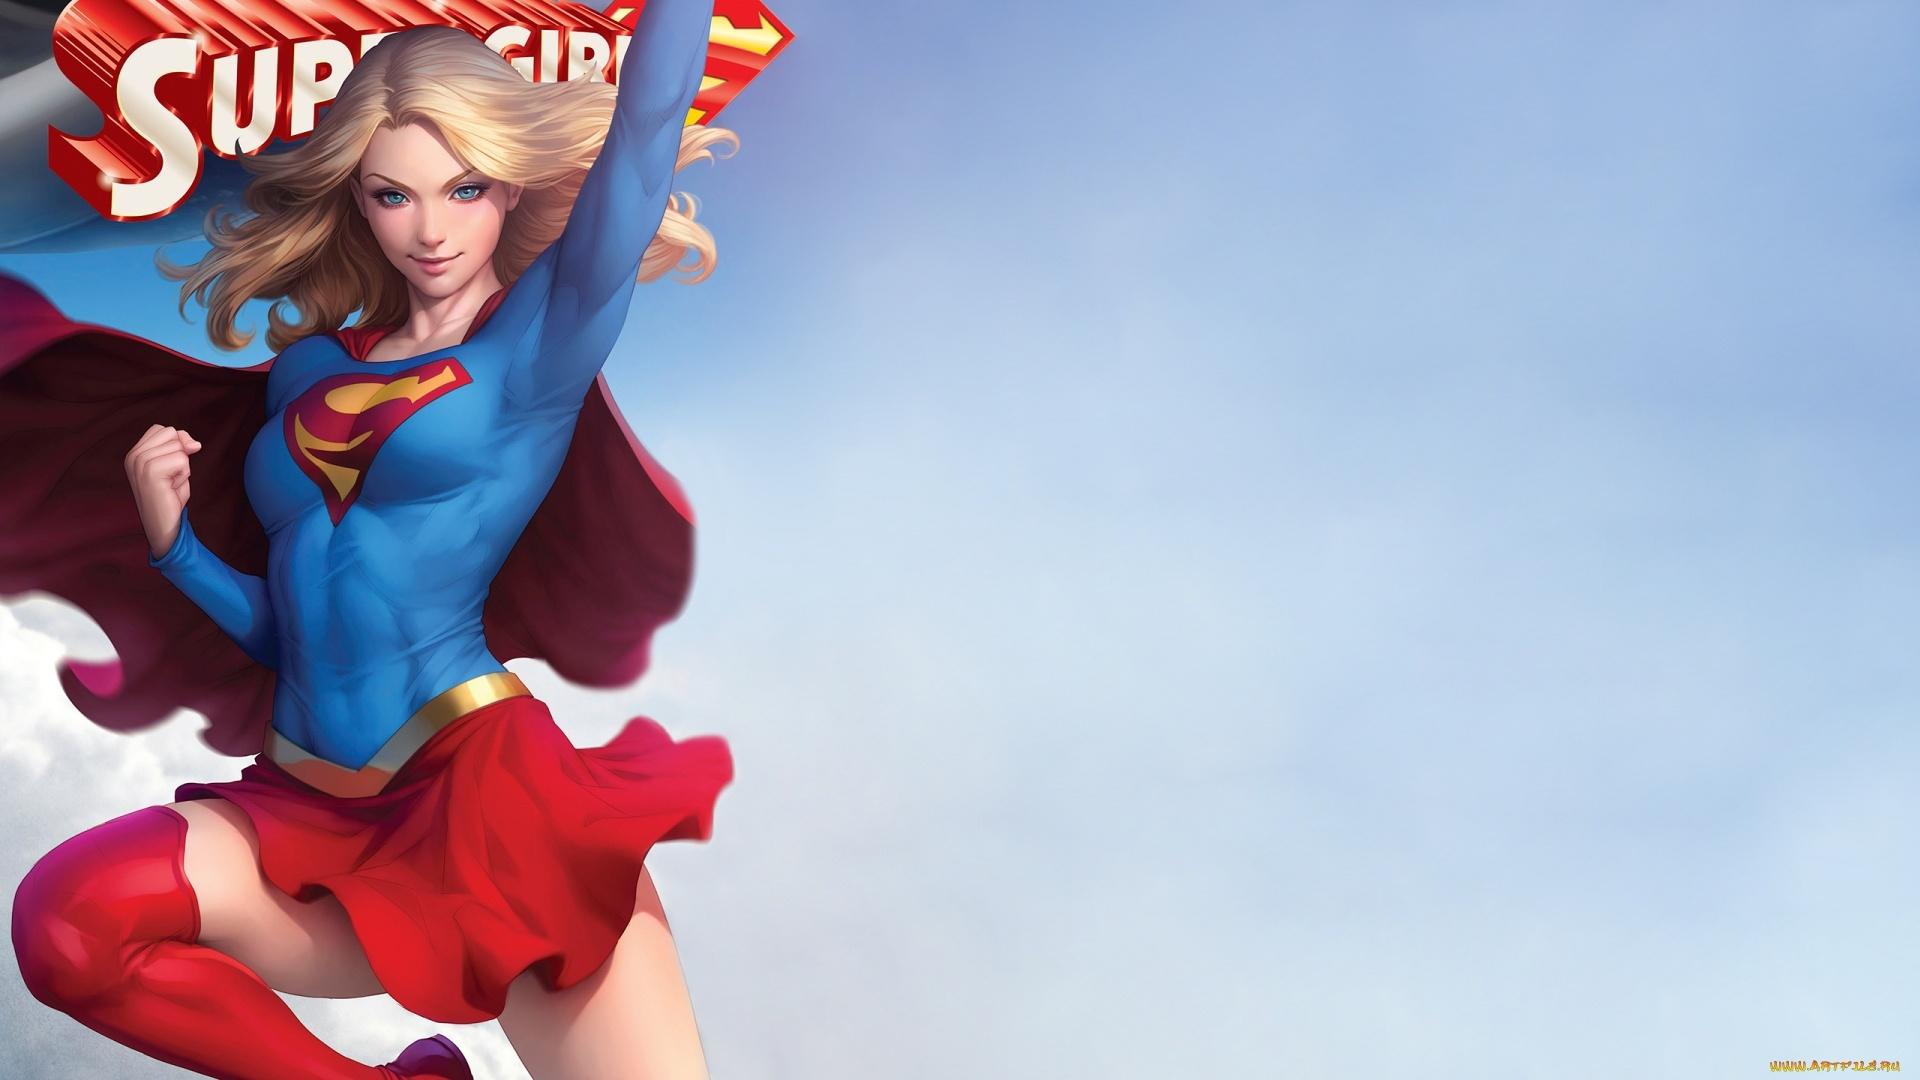 Supergirl windows wallpaper